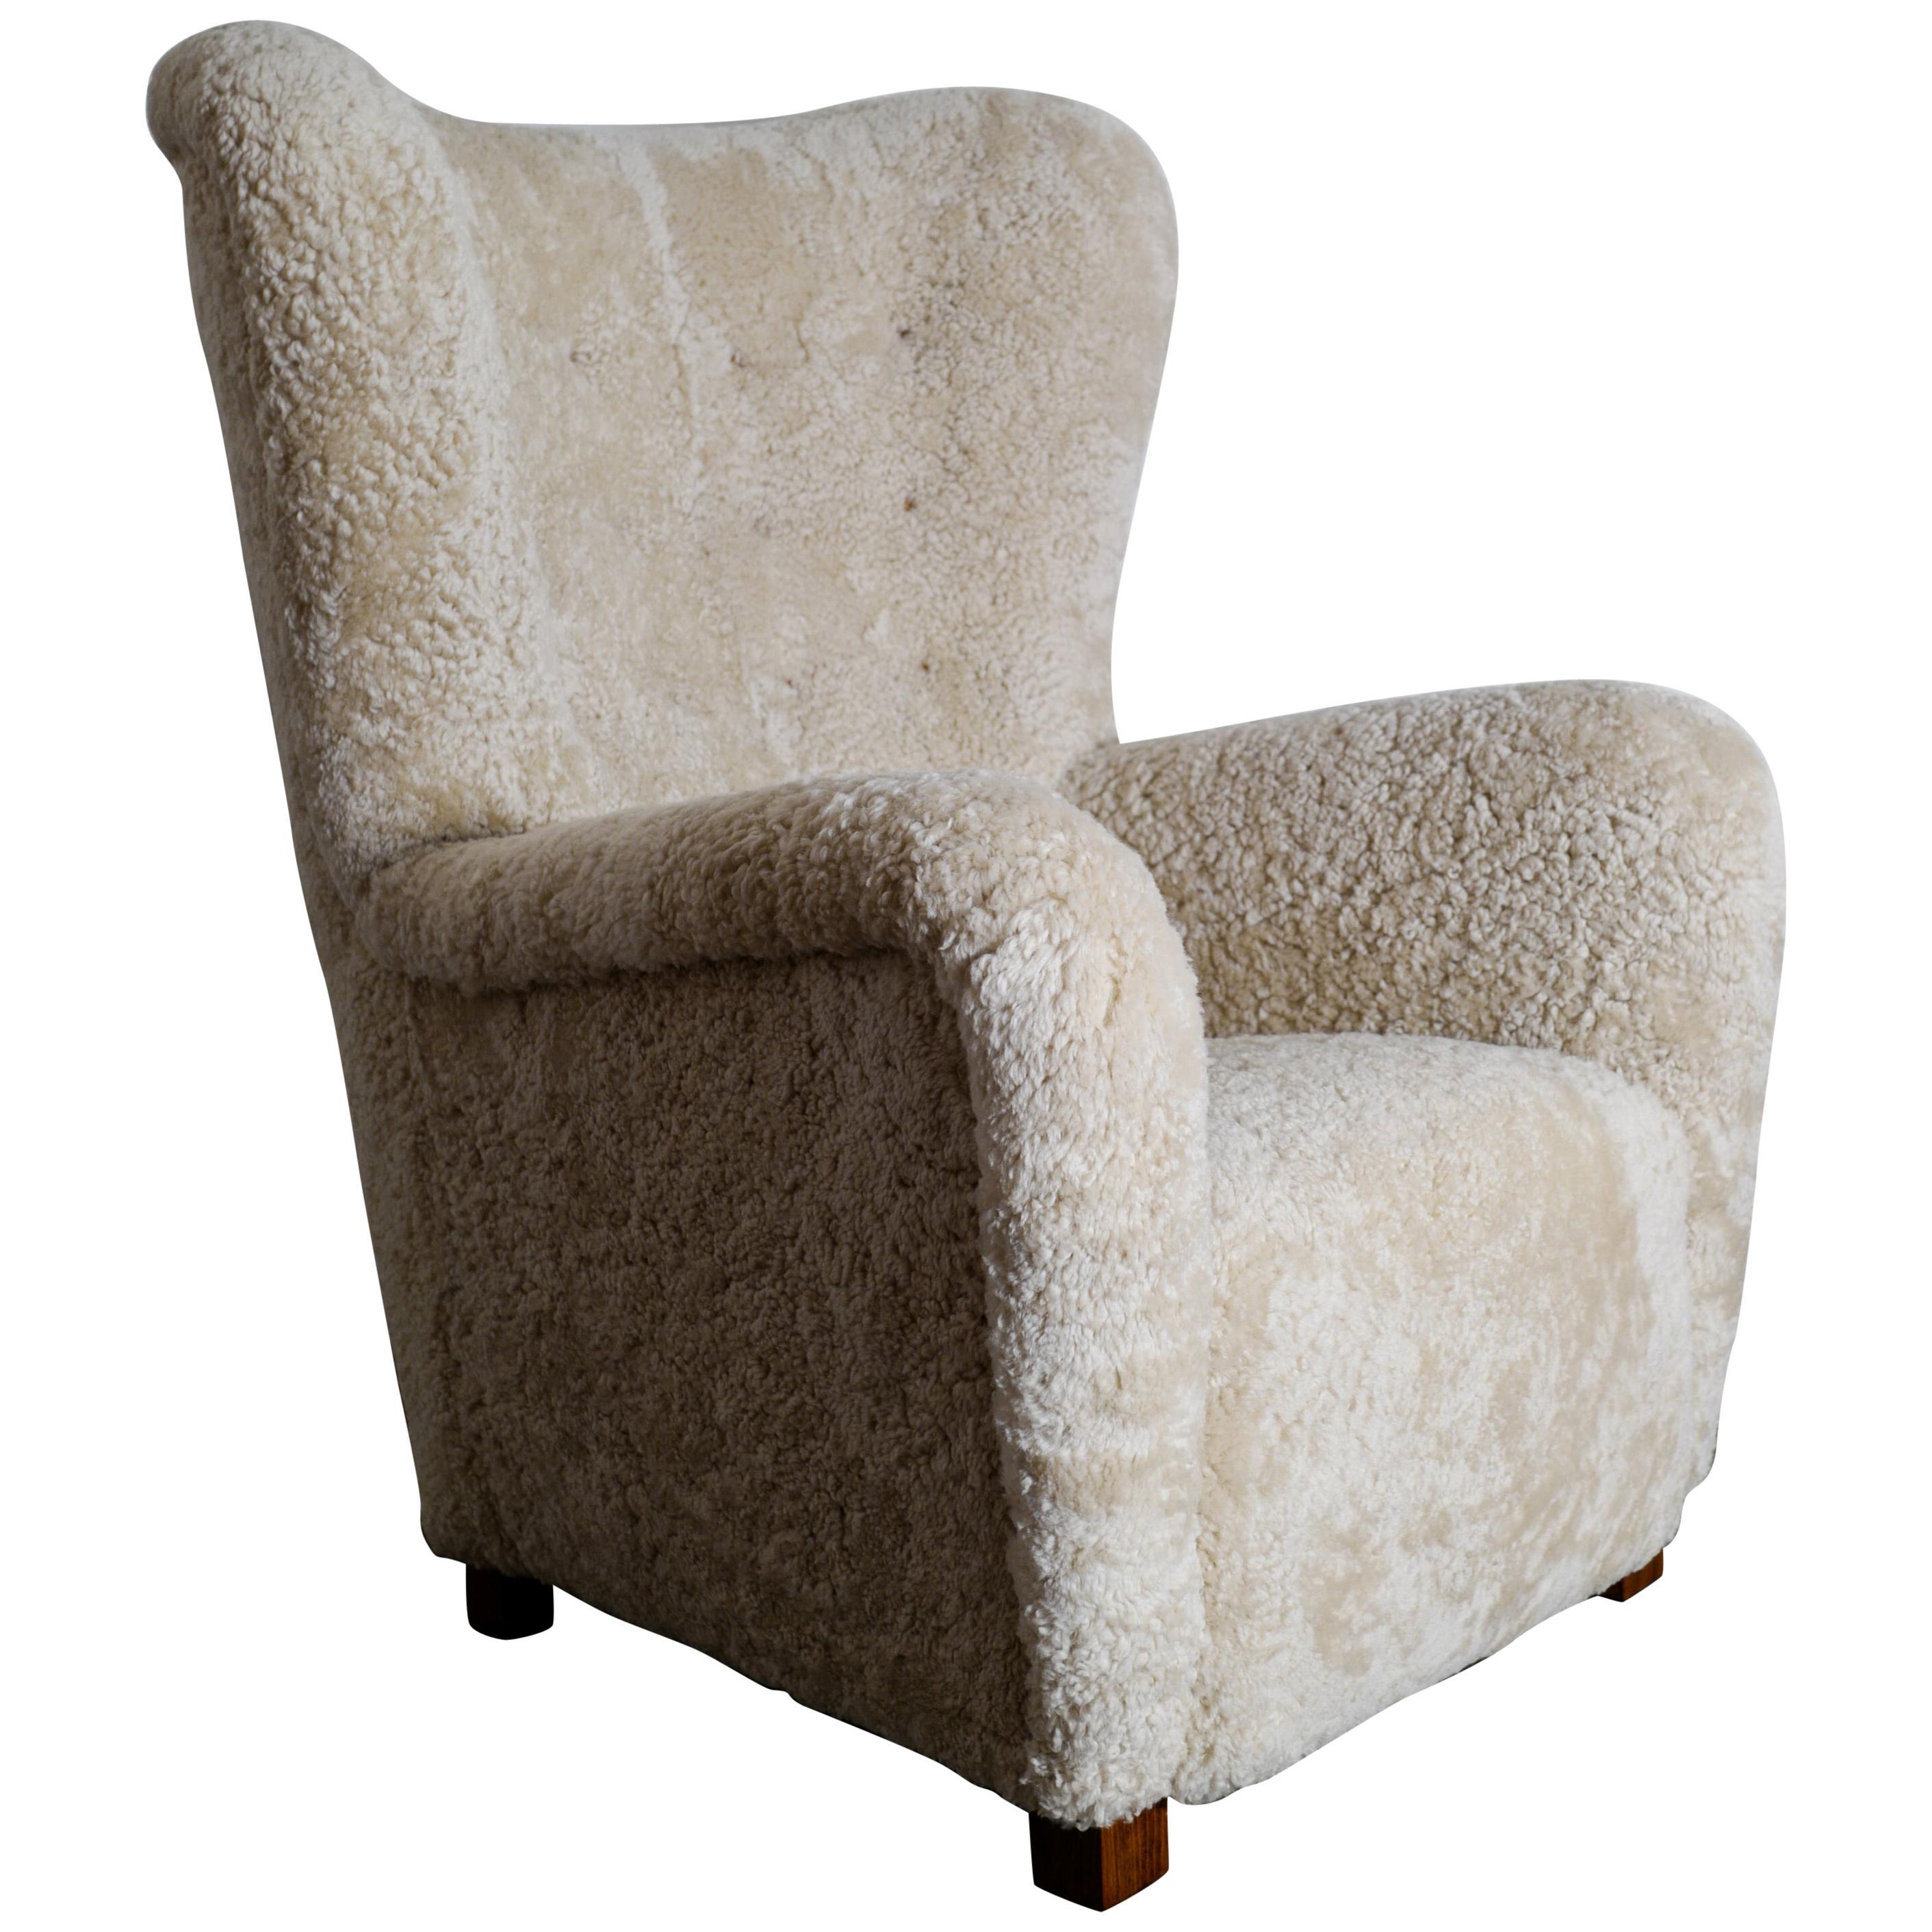 Fritz Hansen Wingback Easy Chair Model 1672 in Sheepskin and Oak, Denmark, 1940s